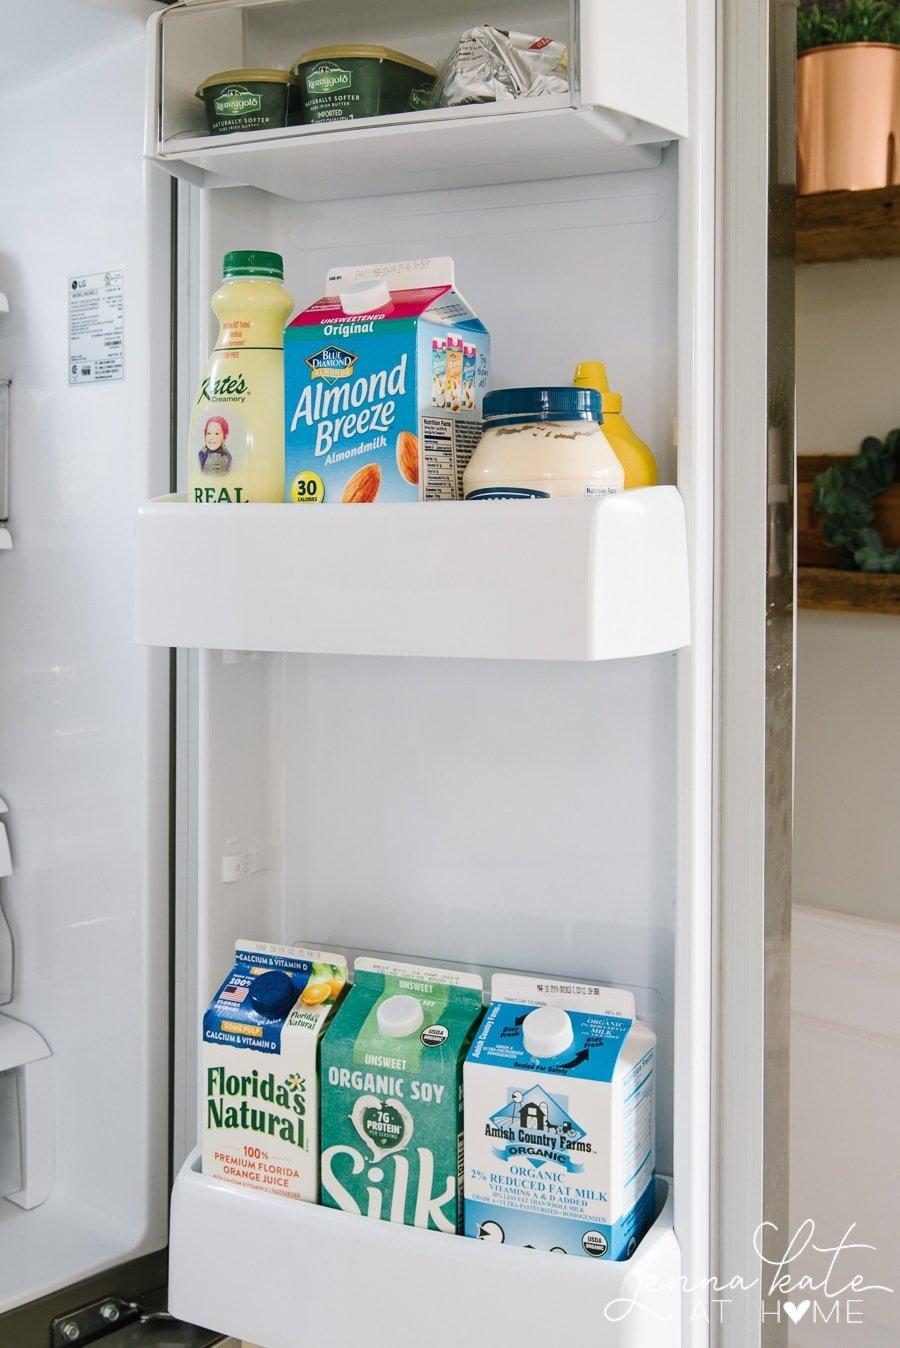 The door of a refrigerator holding various jugs of milk and orange juice